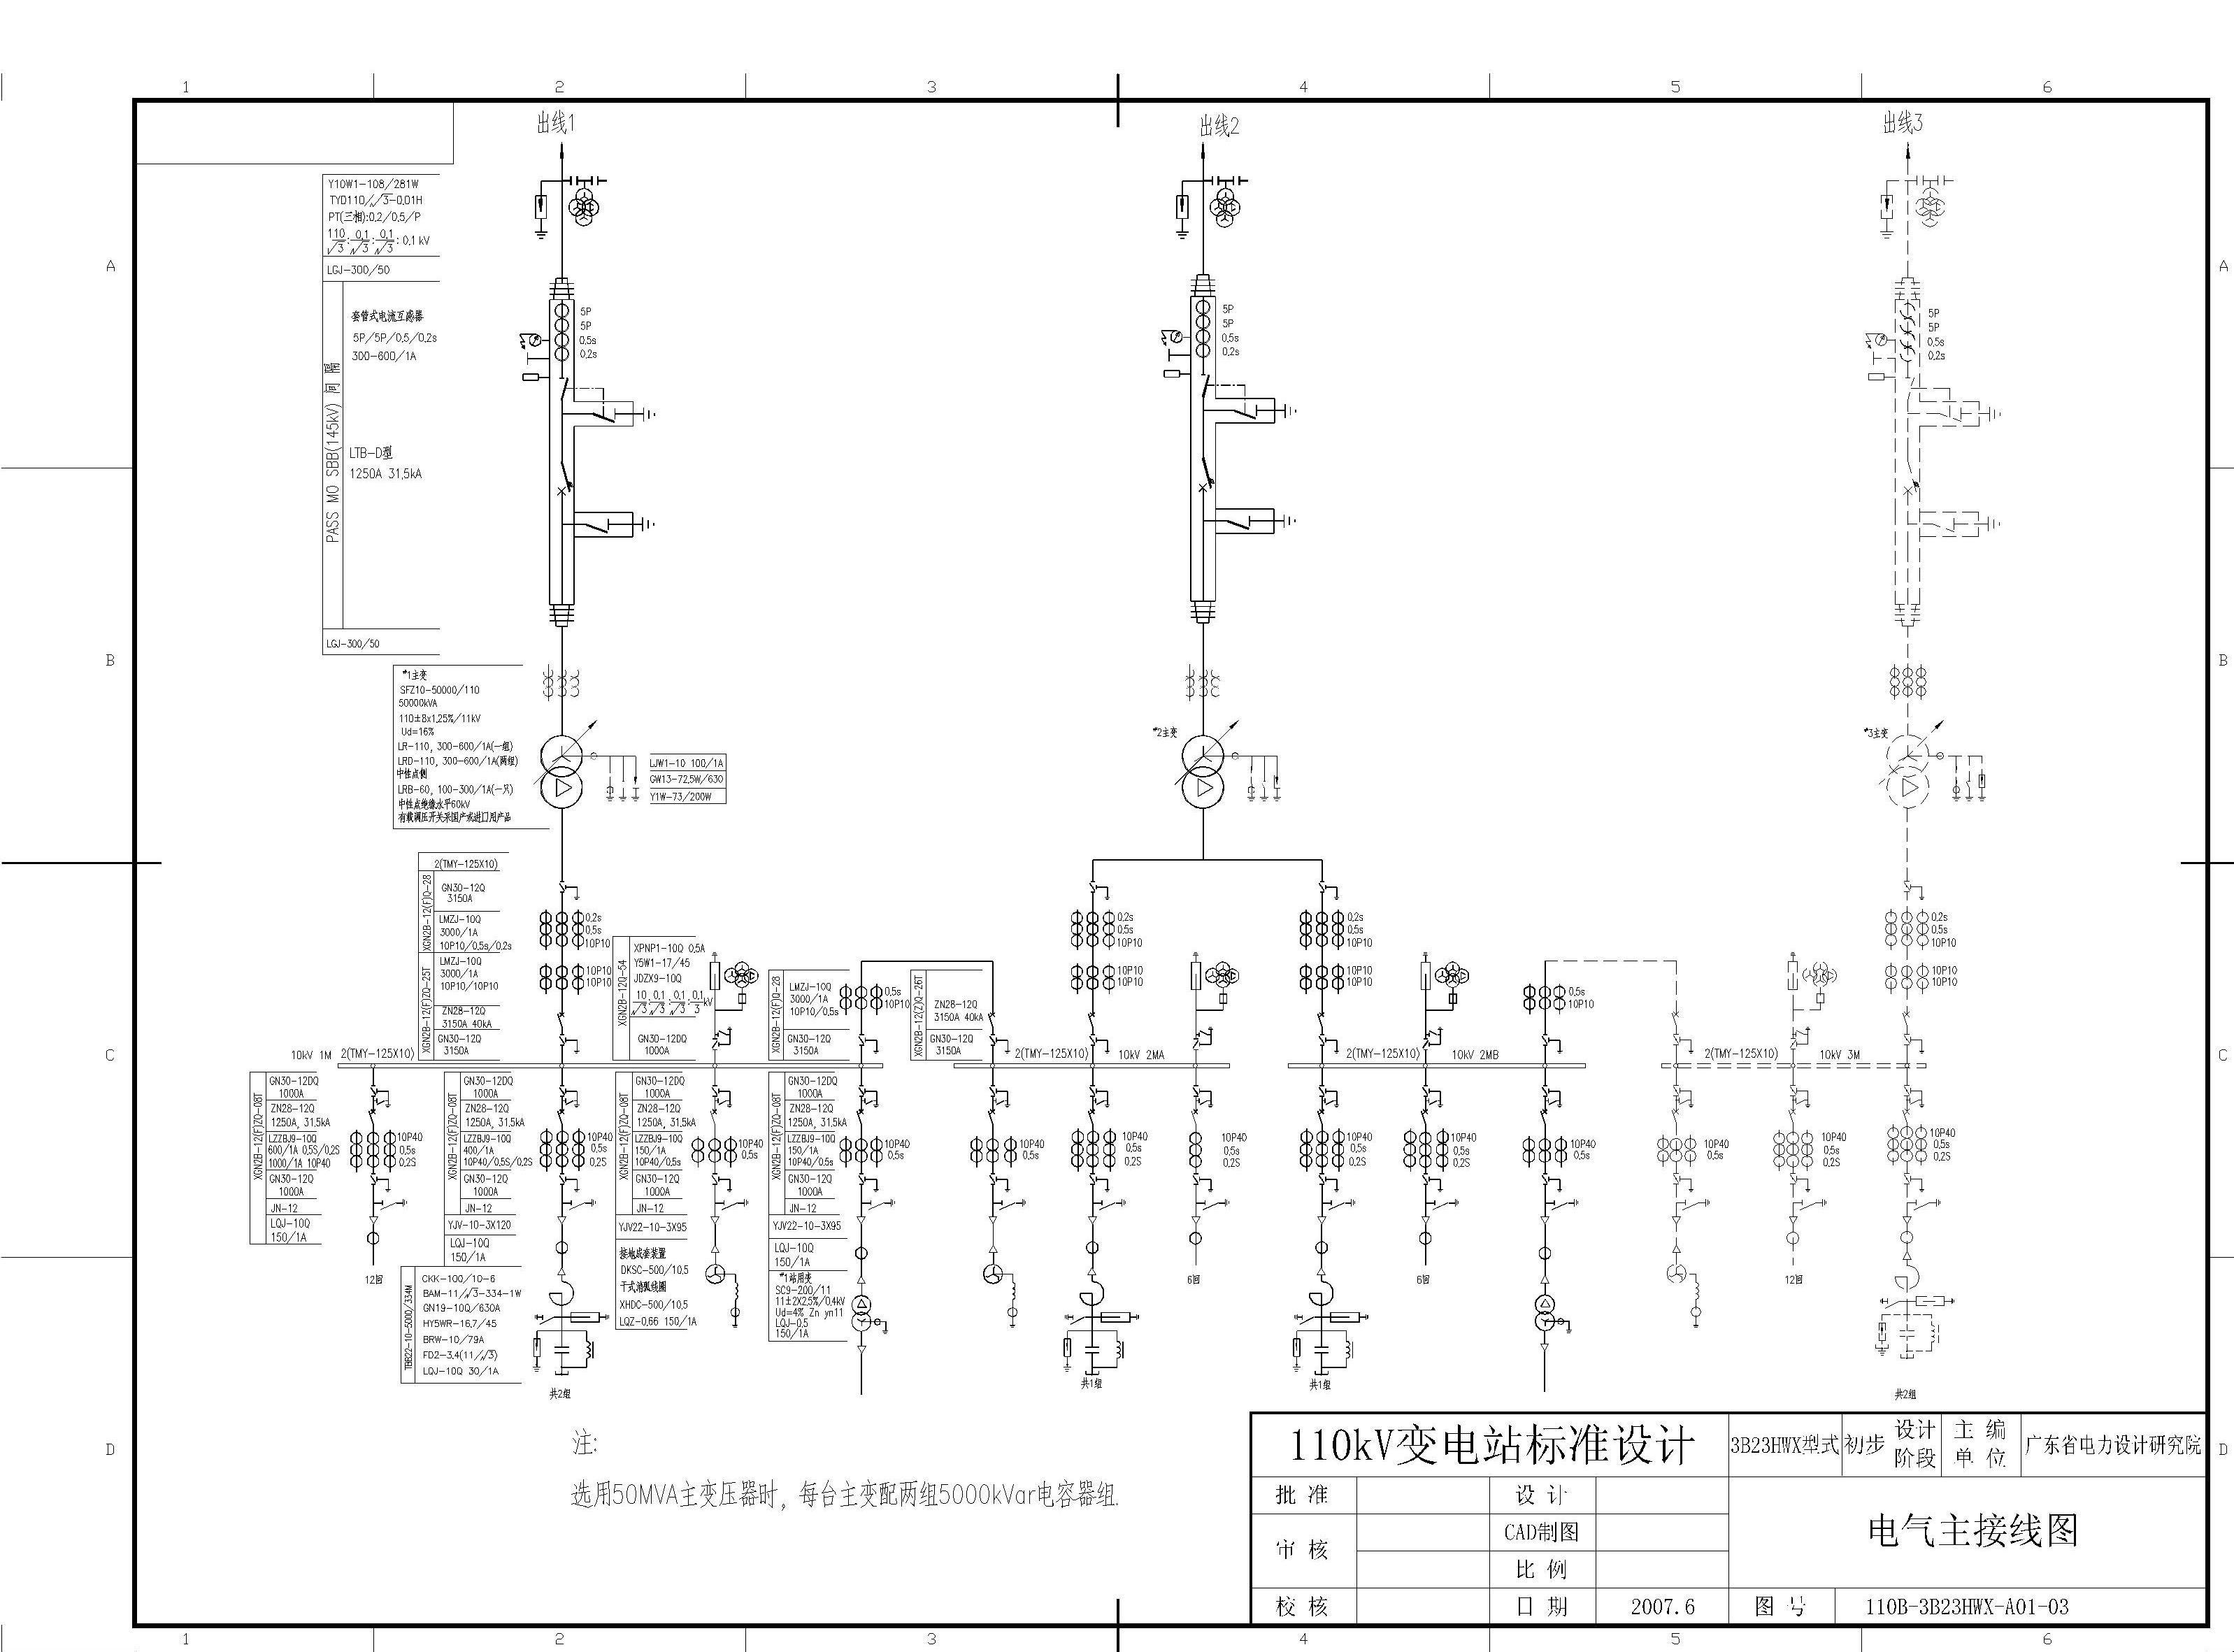 35kv变电所主接线图_帮忙弄下110kv变电站一次主接线图,实在不会,非常感谢。_百度知道